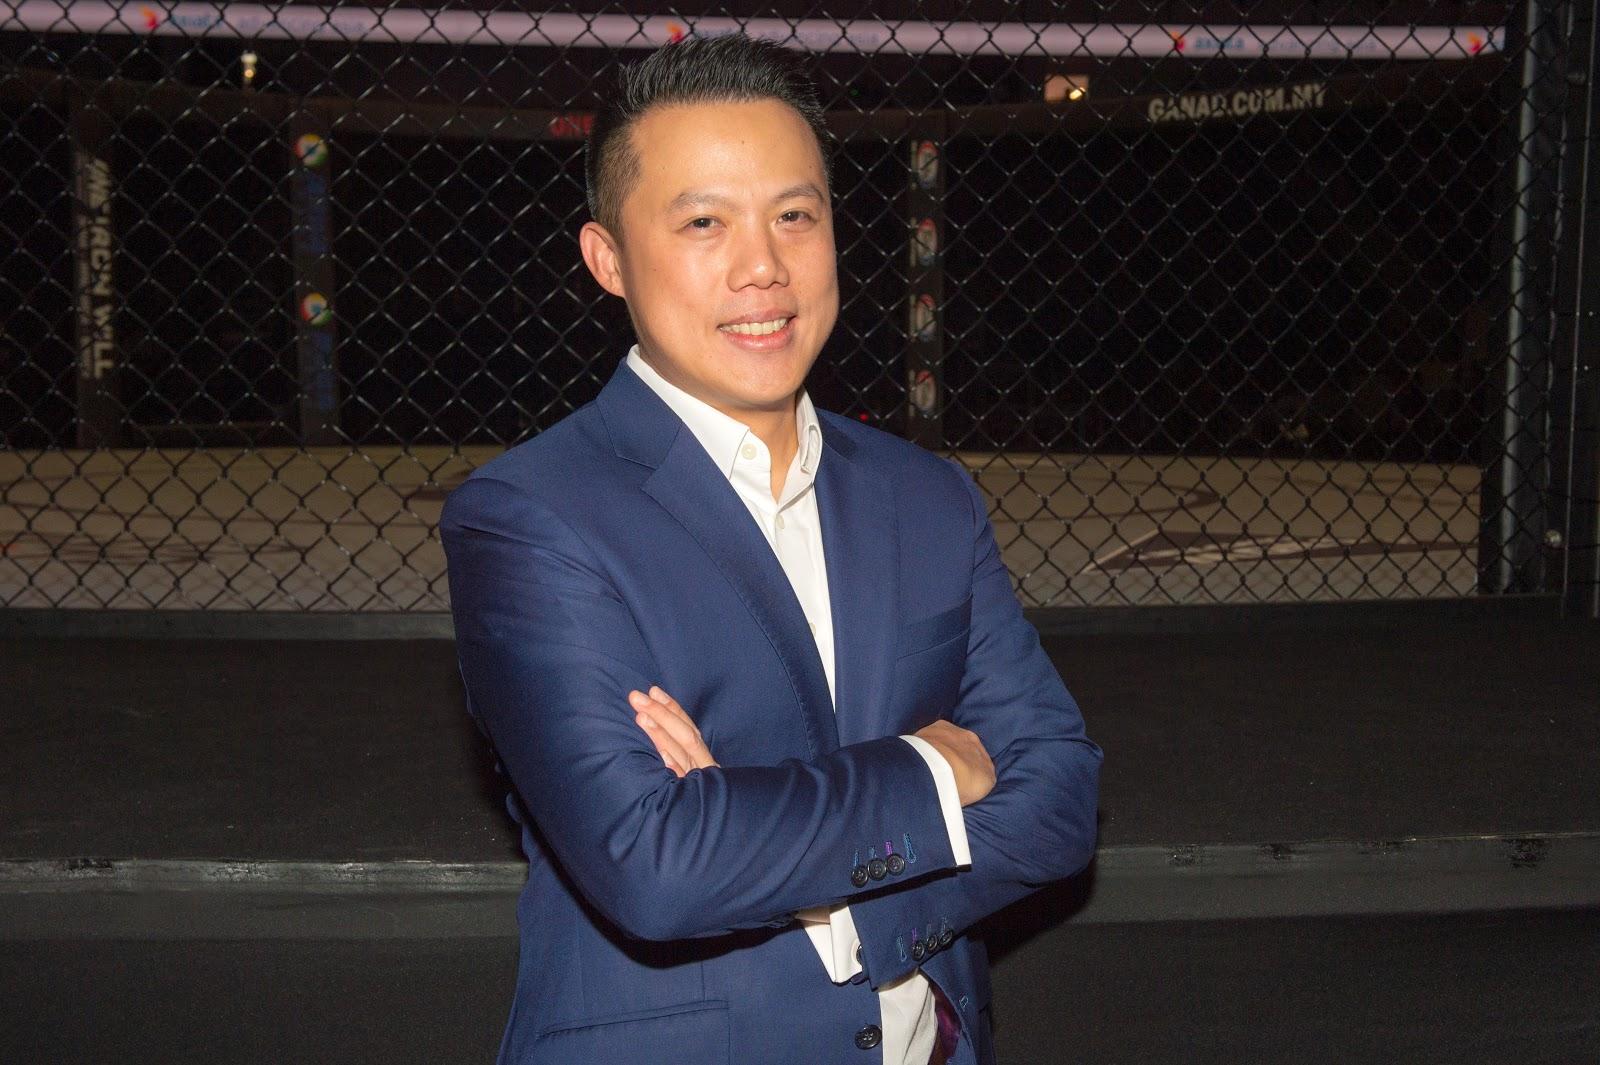 HUA FUNG TEH NAMED CHAIRMAN OF ONE CHAMPIONSHIP IN CHINA - HUA FUNG TEH